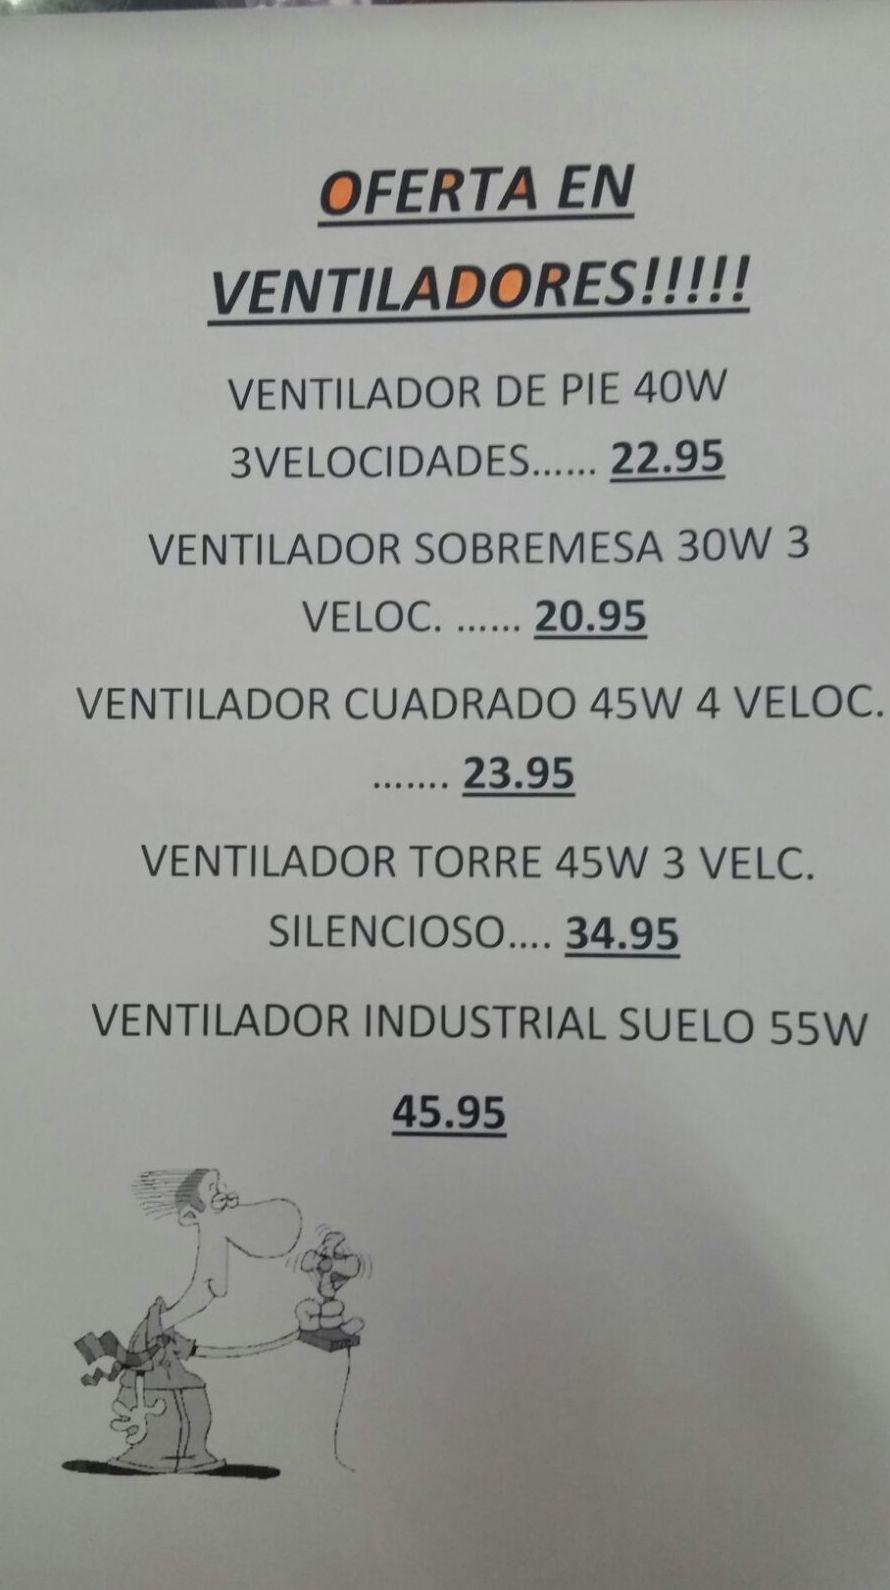 ofertas ventiladores Tenerife